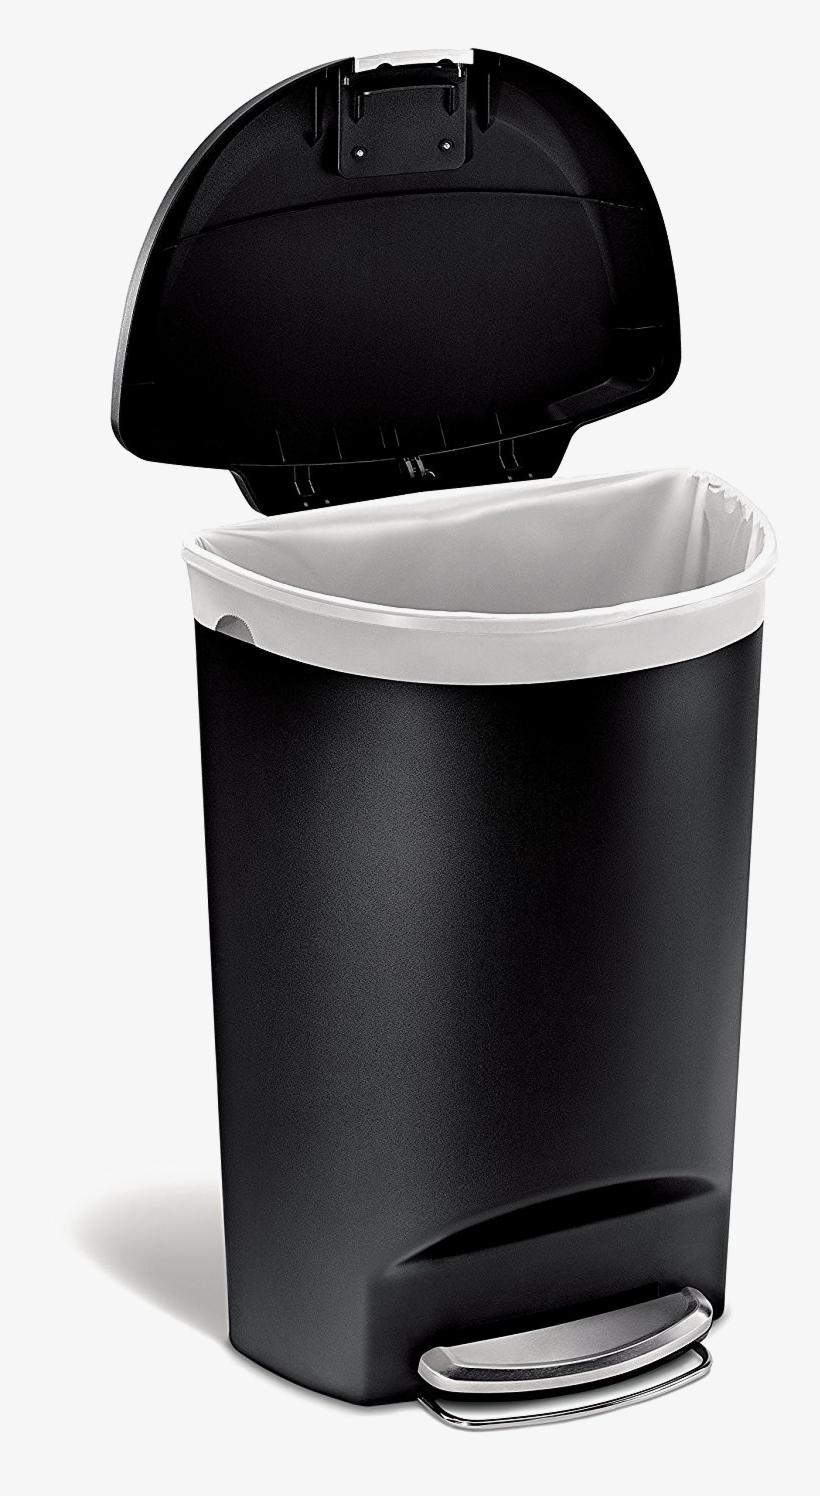 Trash Can Png Photo - Simplehuman Plastic Semi Round 50 Liter Step, transparent png #159290